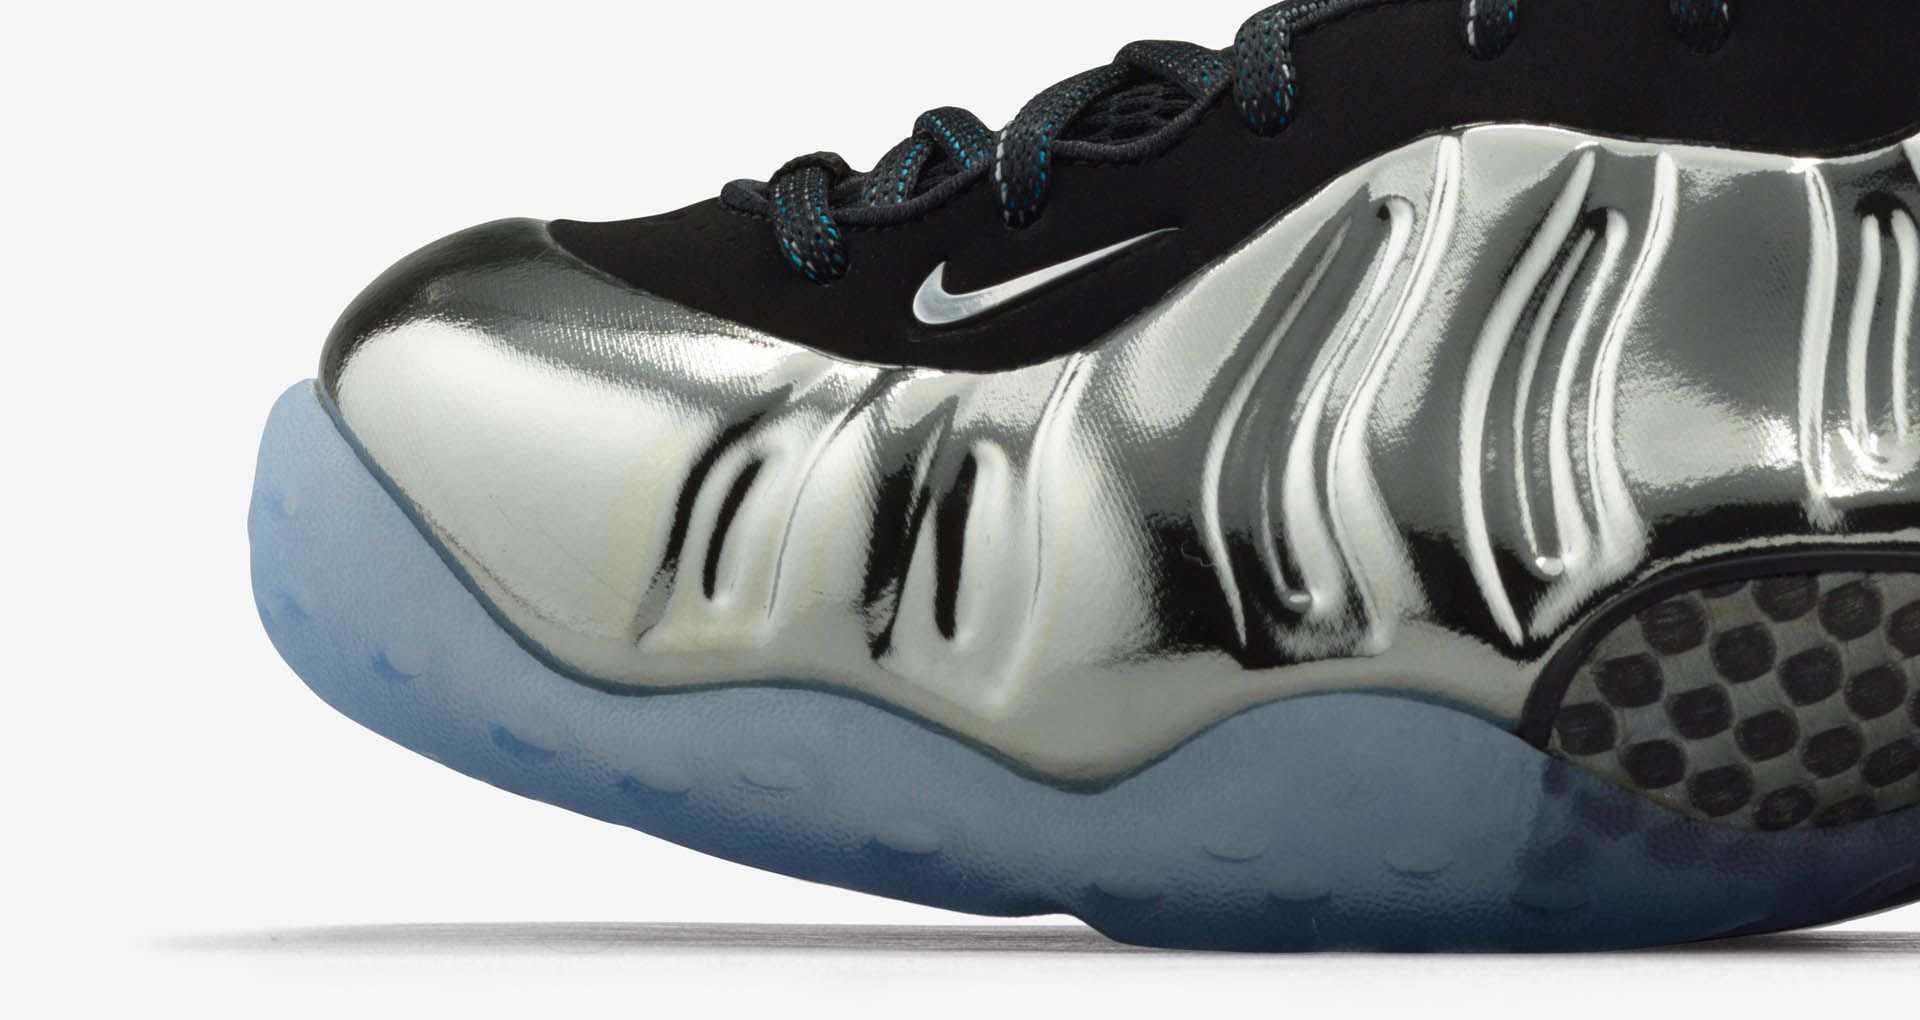 super popular dbd80 8760b Nike Air Foamposite One 'Chromeposite' Release Date. Nike+ ...